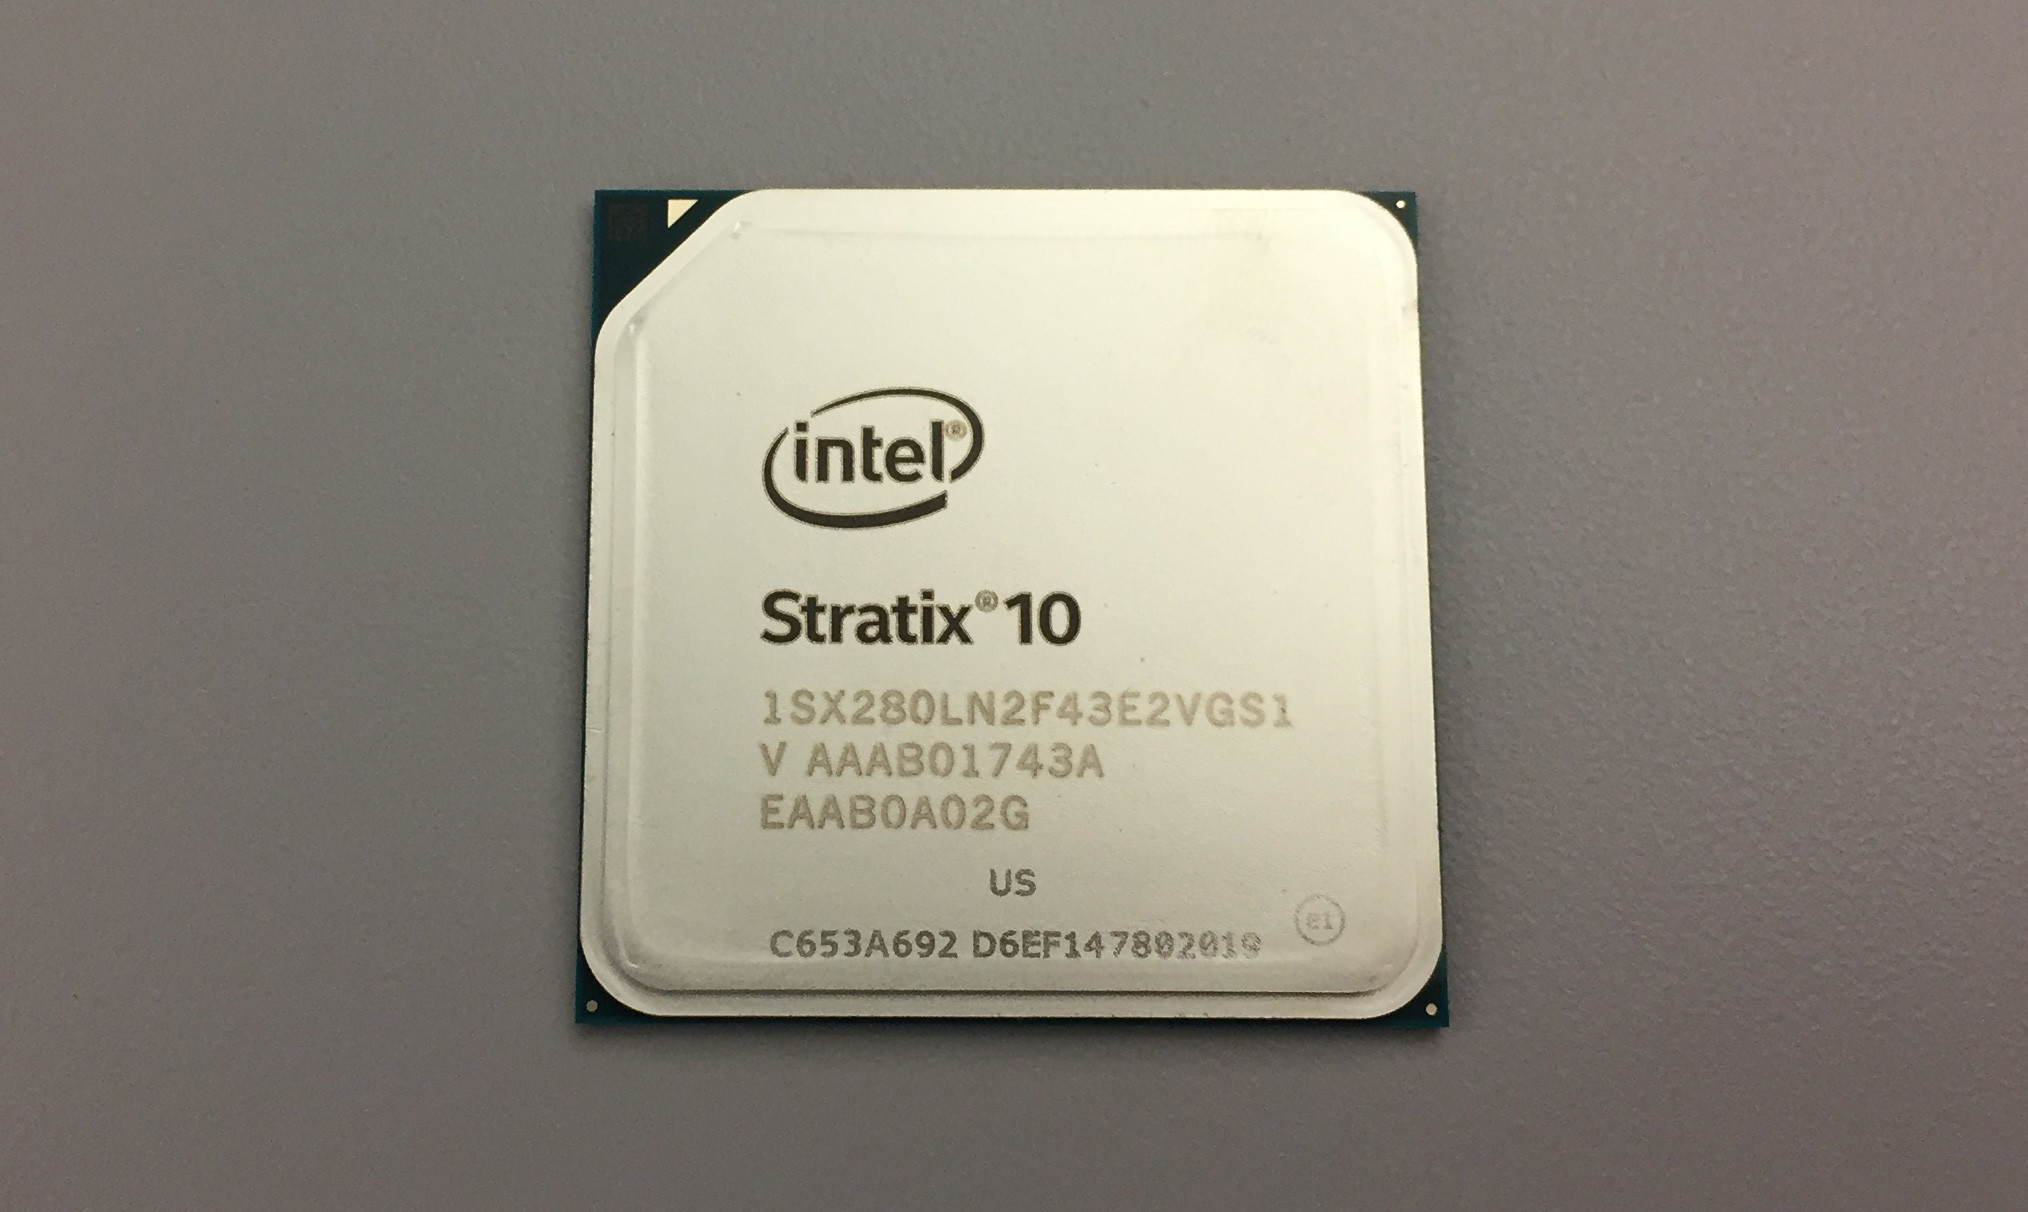 Intel Announces High-Density ARM-based Stratix 10 FPGA on 14 nm